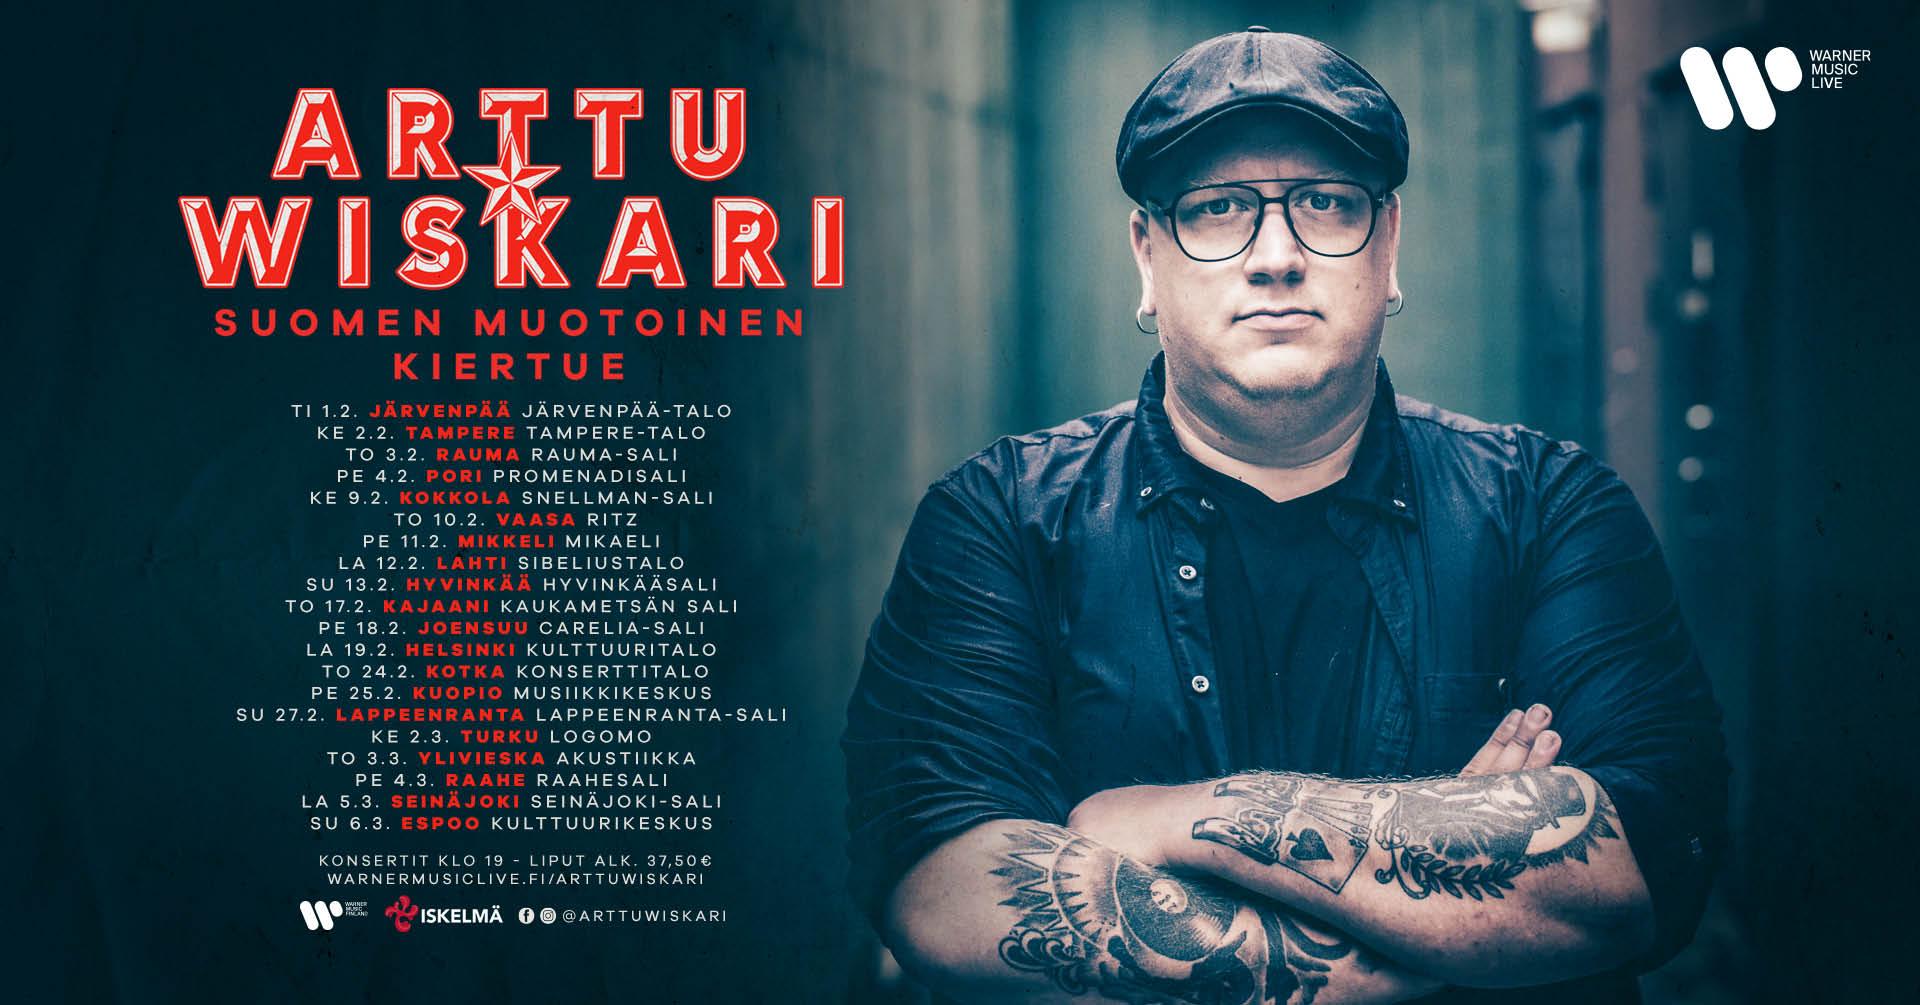 Arttu Wiskari - Suomen Muotoinen Kiertue